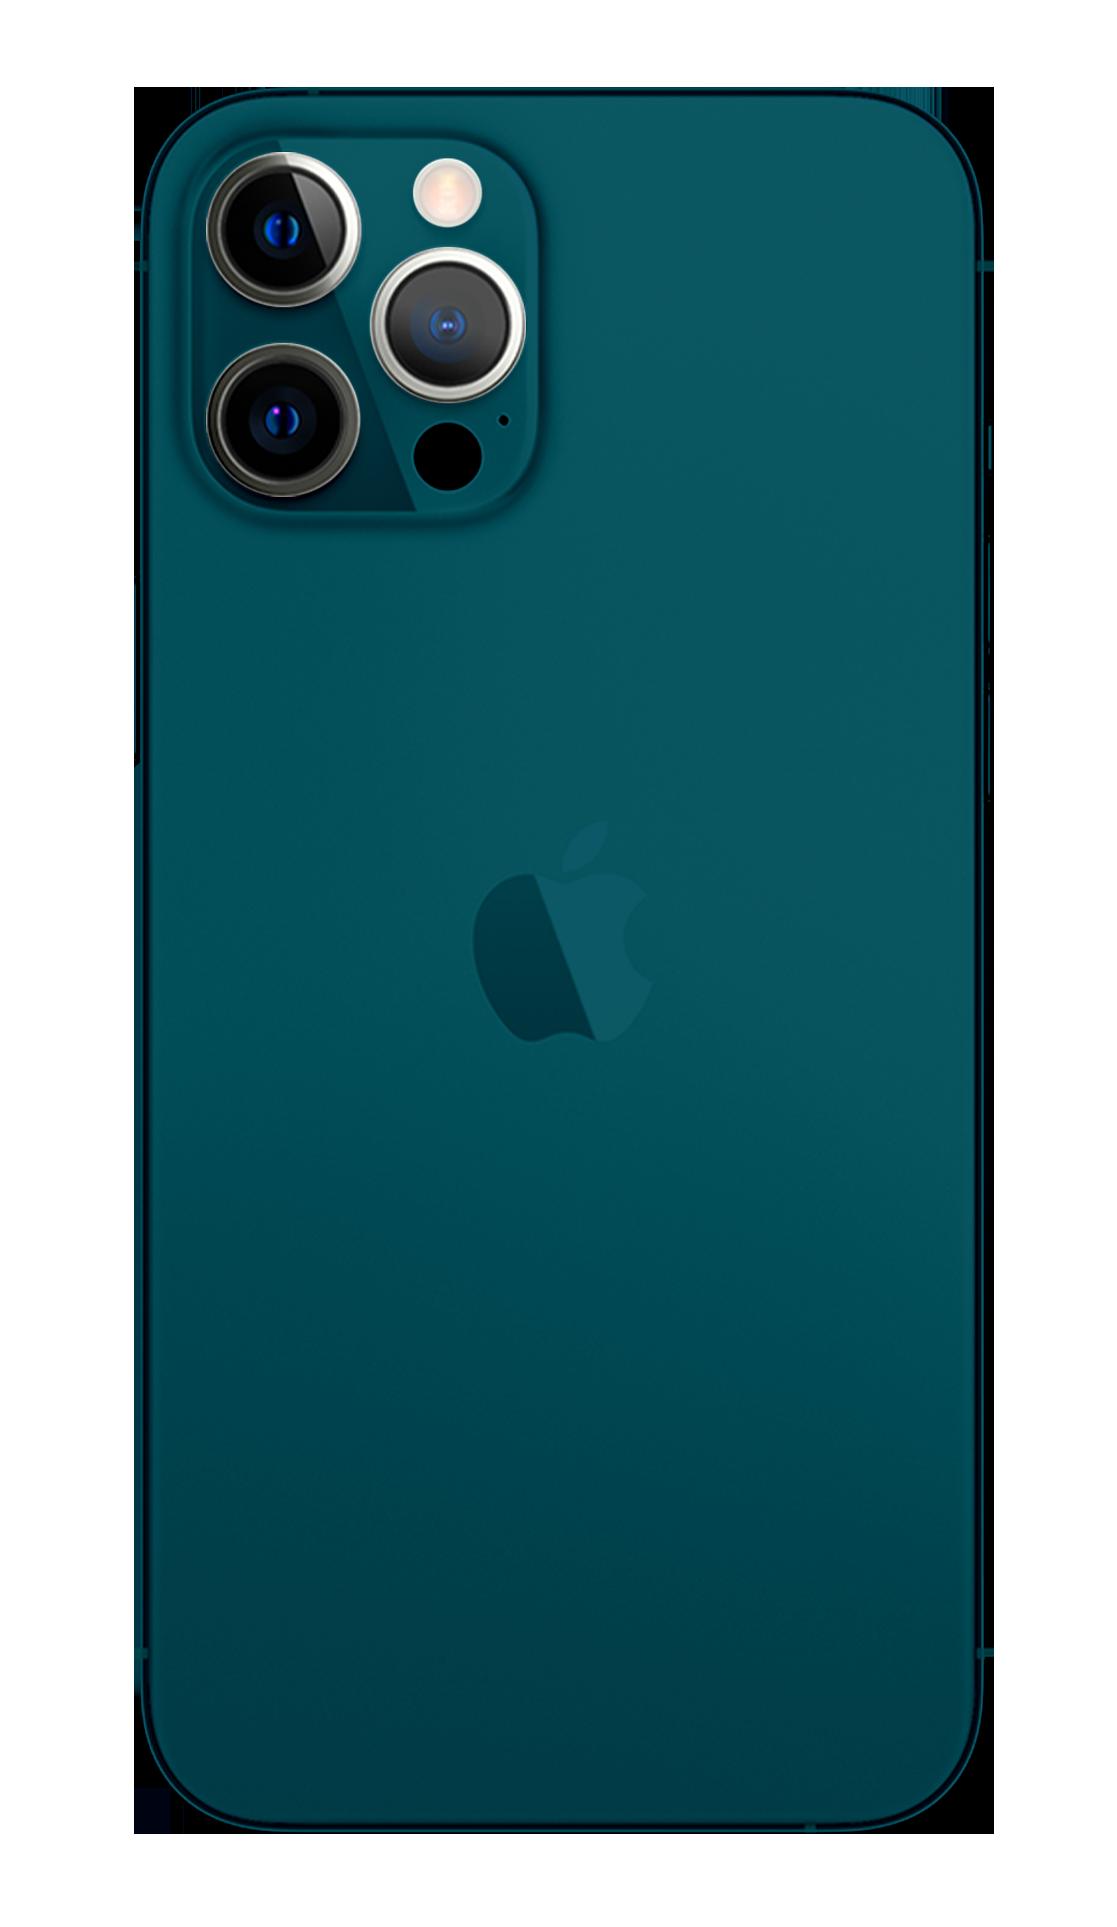 Plooh phone